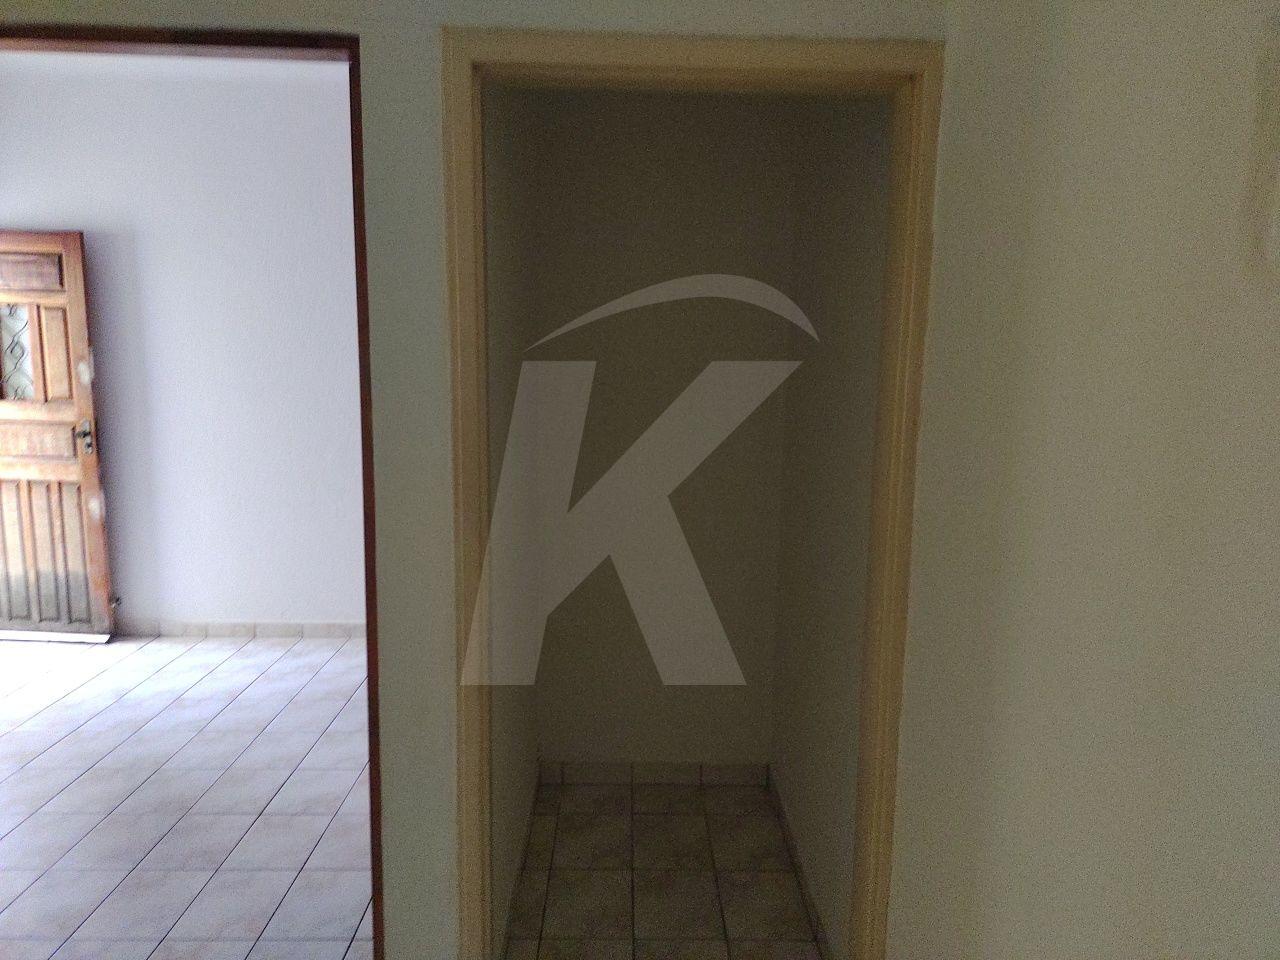 Alugar - Casa  - Jardim São Paulo(Zona Norte) - 1 dormitórios.